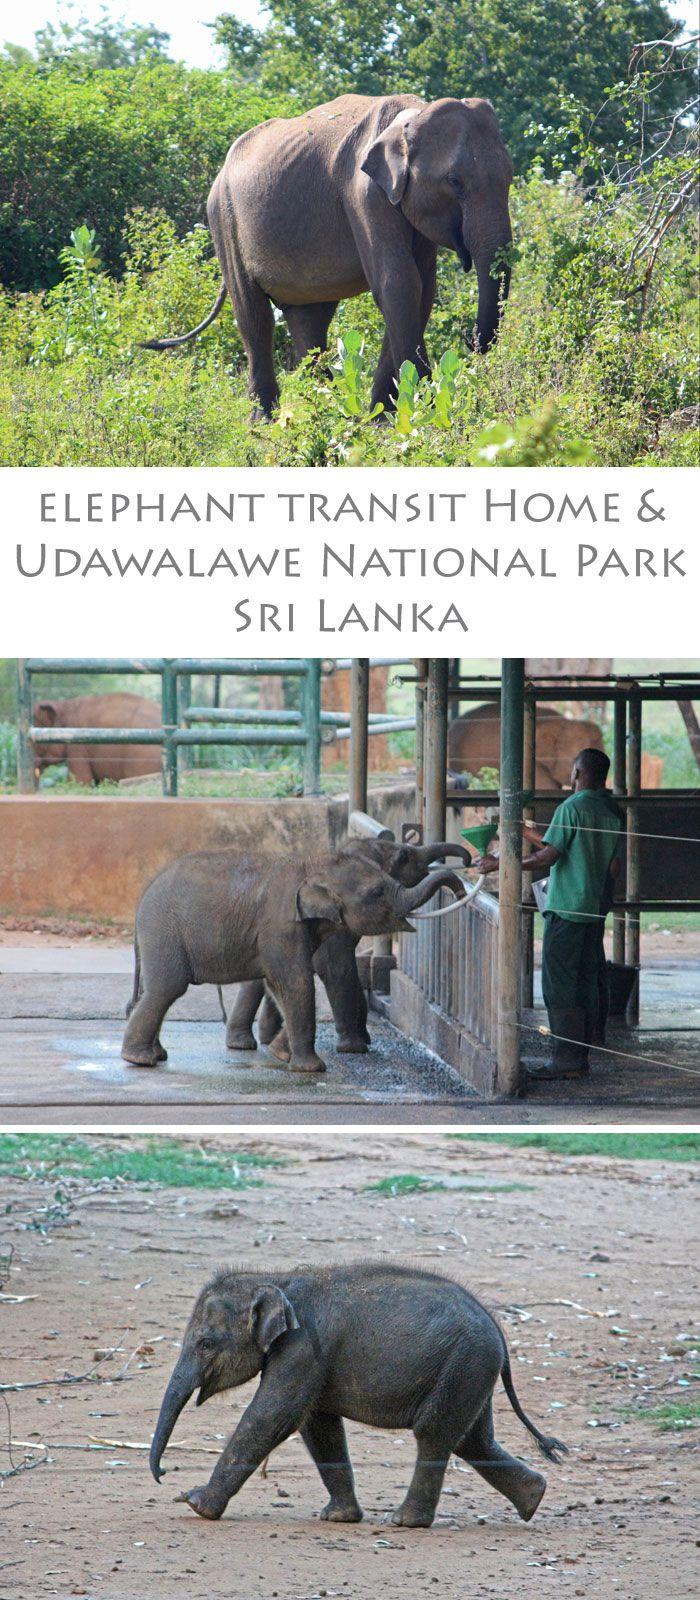 Elephant Transit Home & Udawalawe National Park, Sri Lanka (Elefanten Safari)